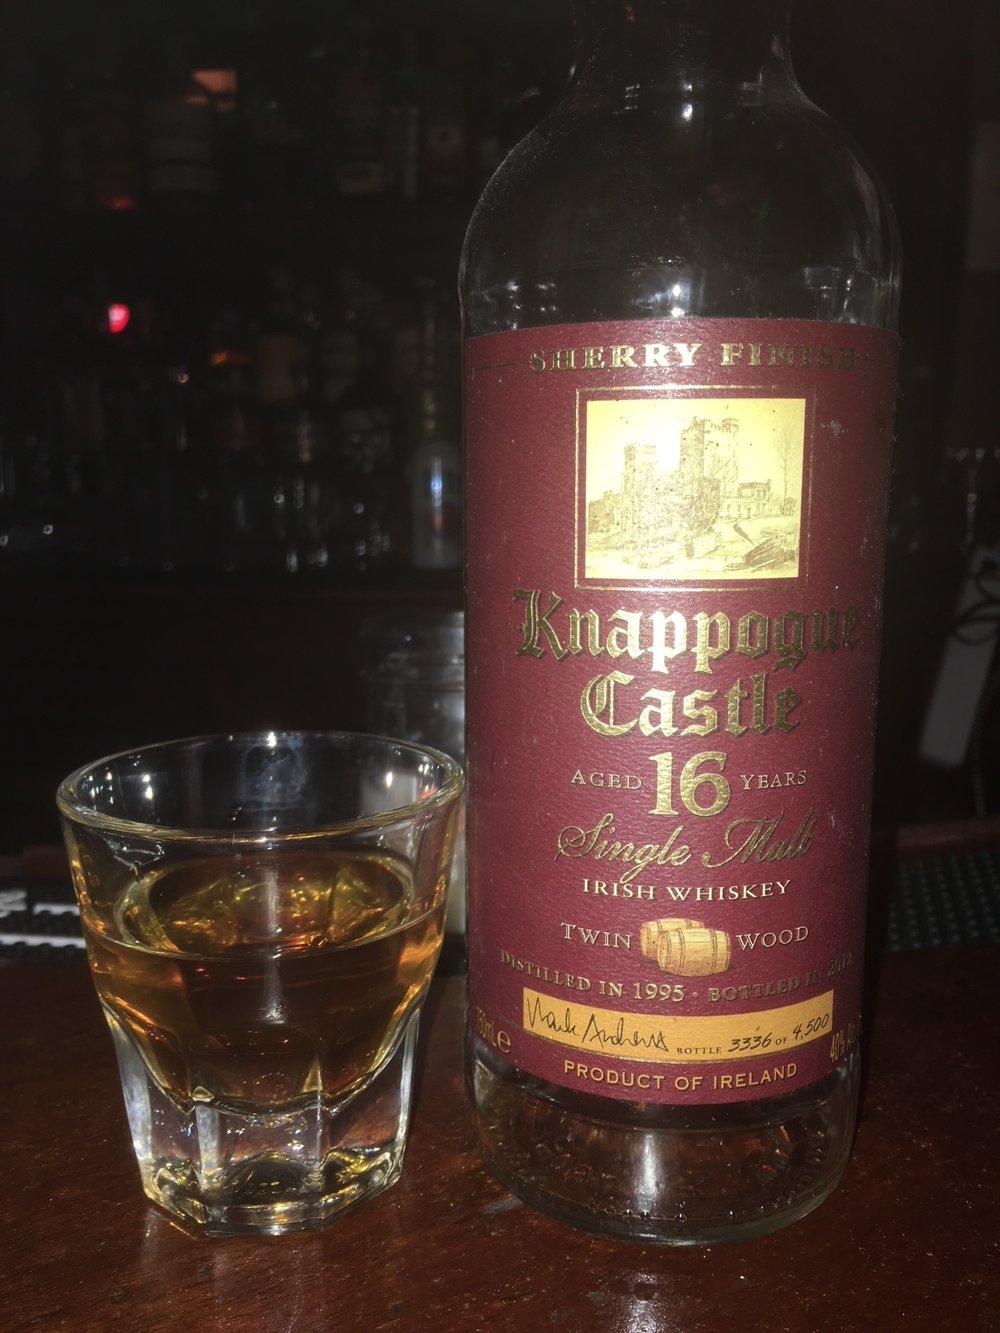 knappogue 16 sherry.jpg